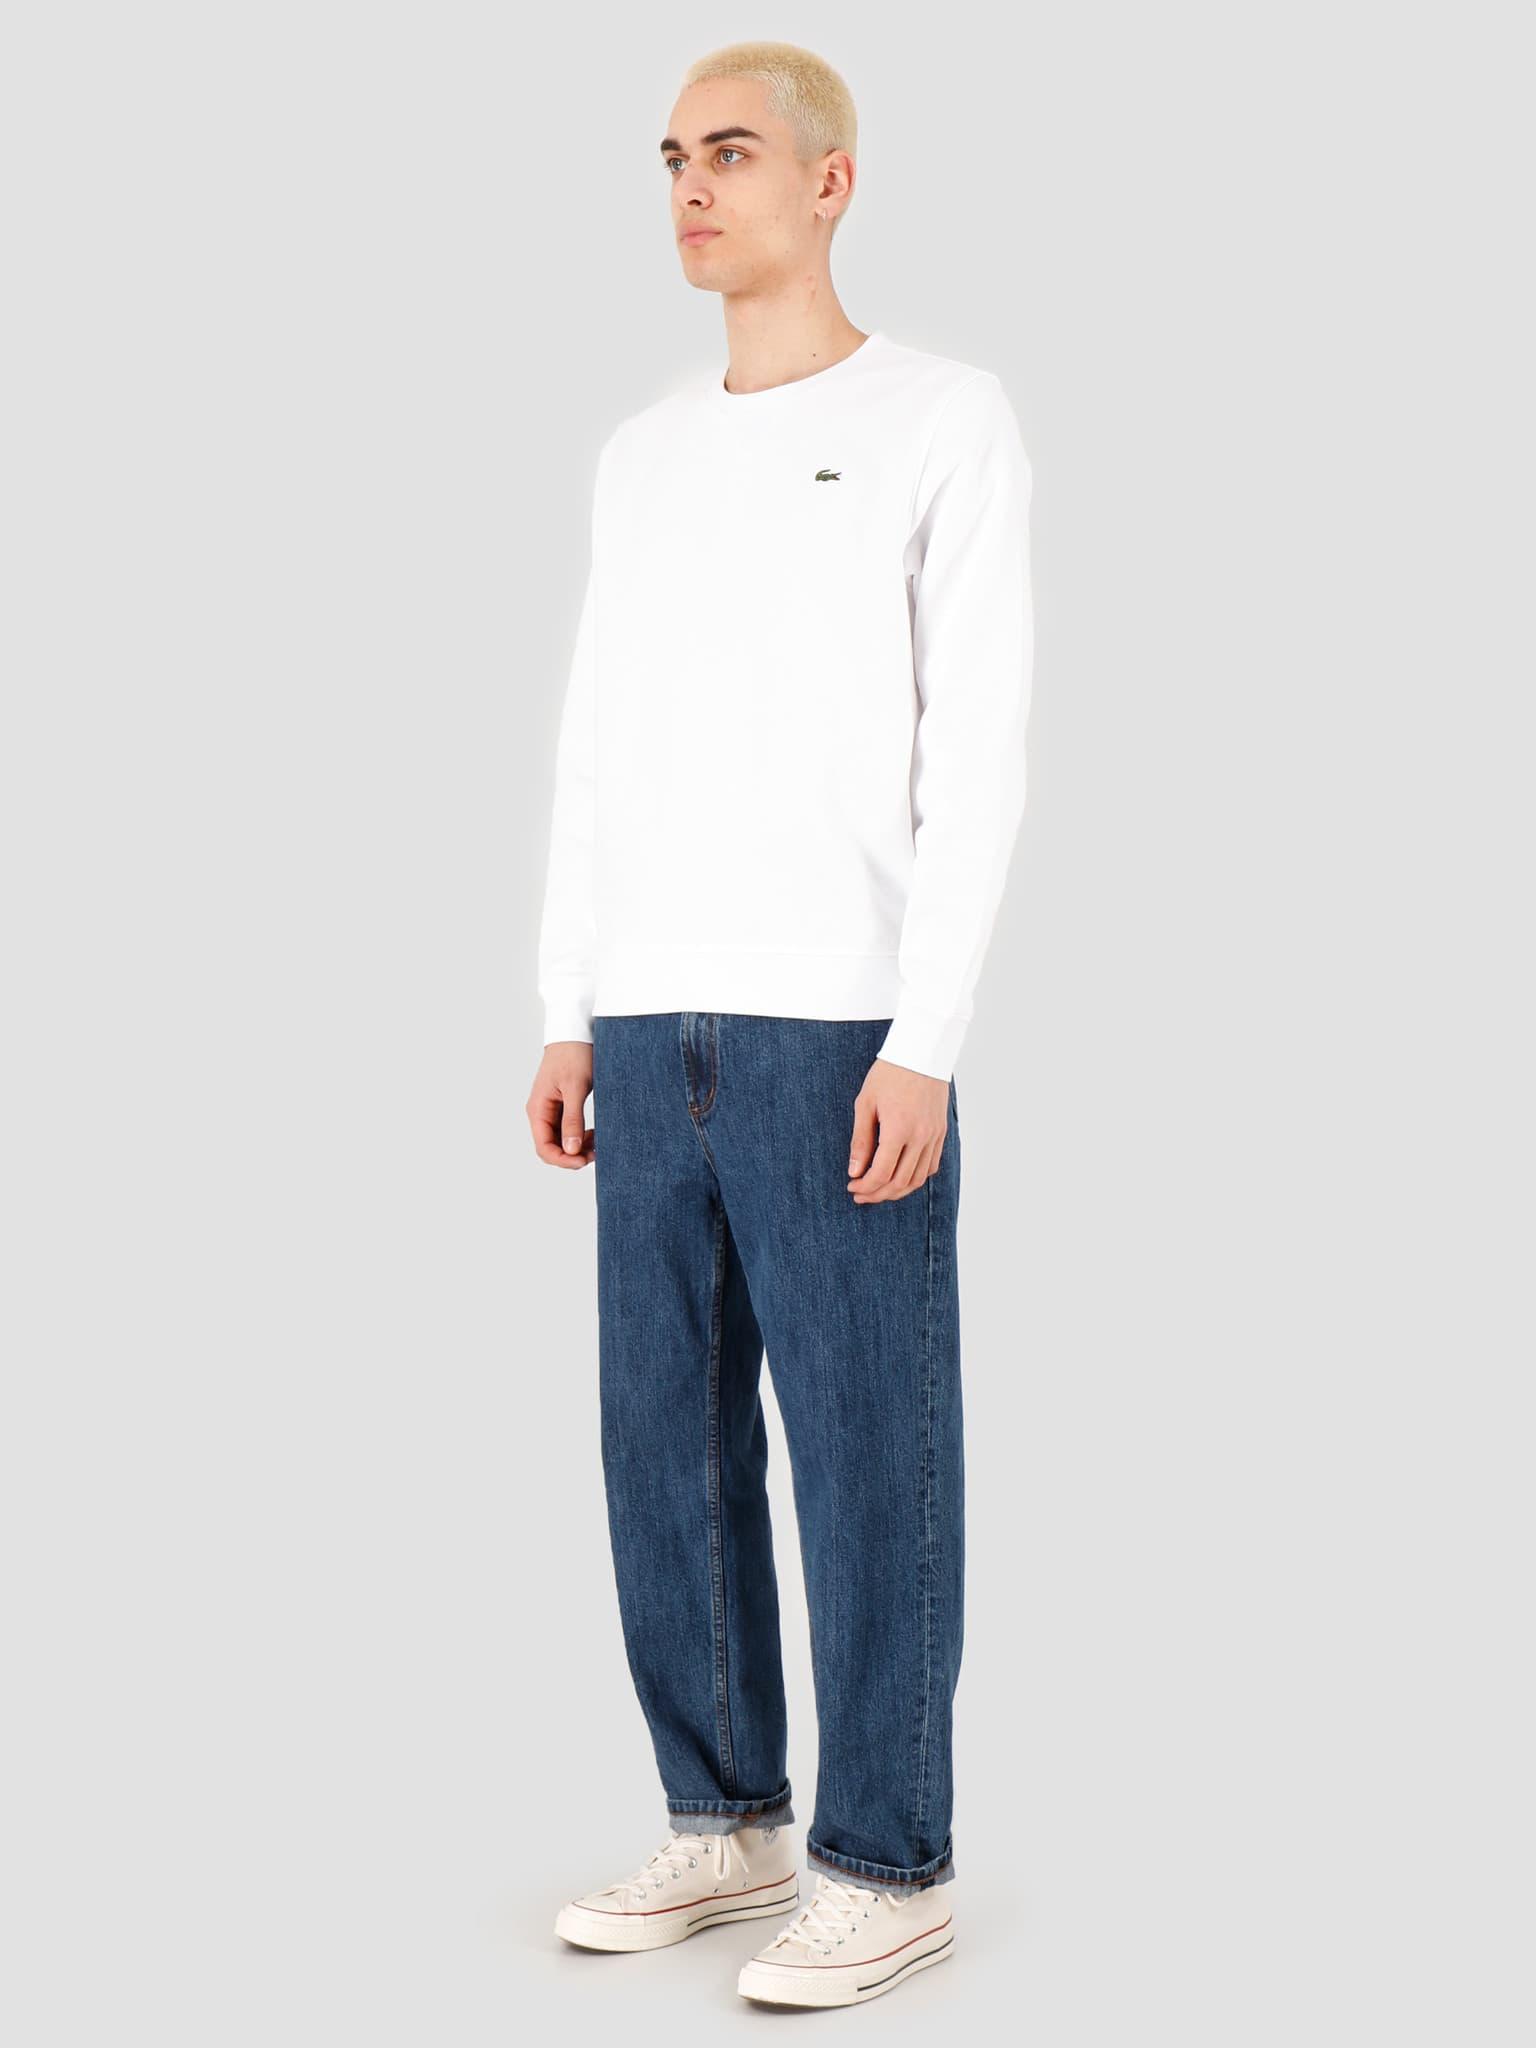 1HS1 Men's sweatshirt 01 White SH7613-01